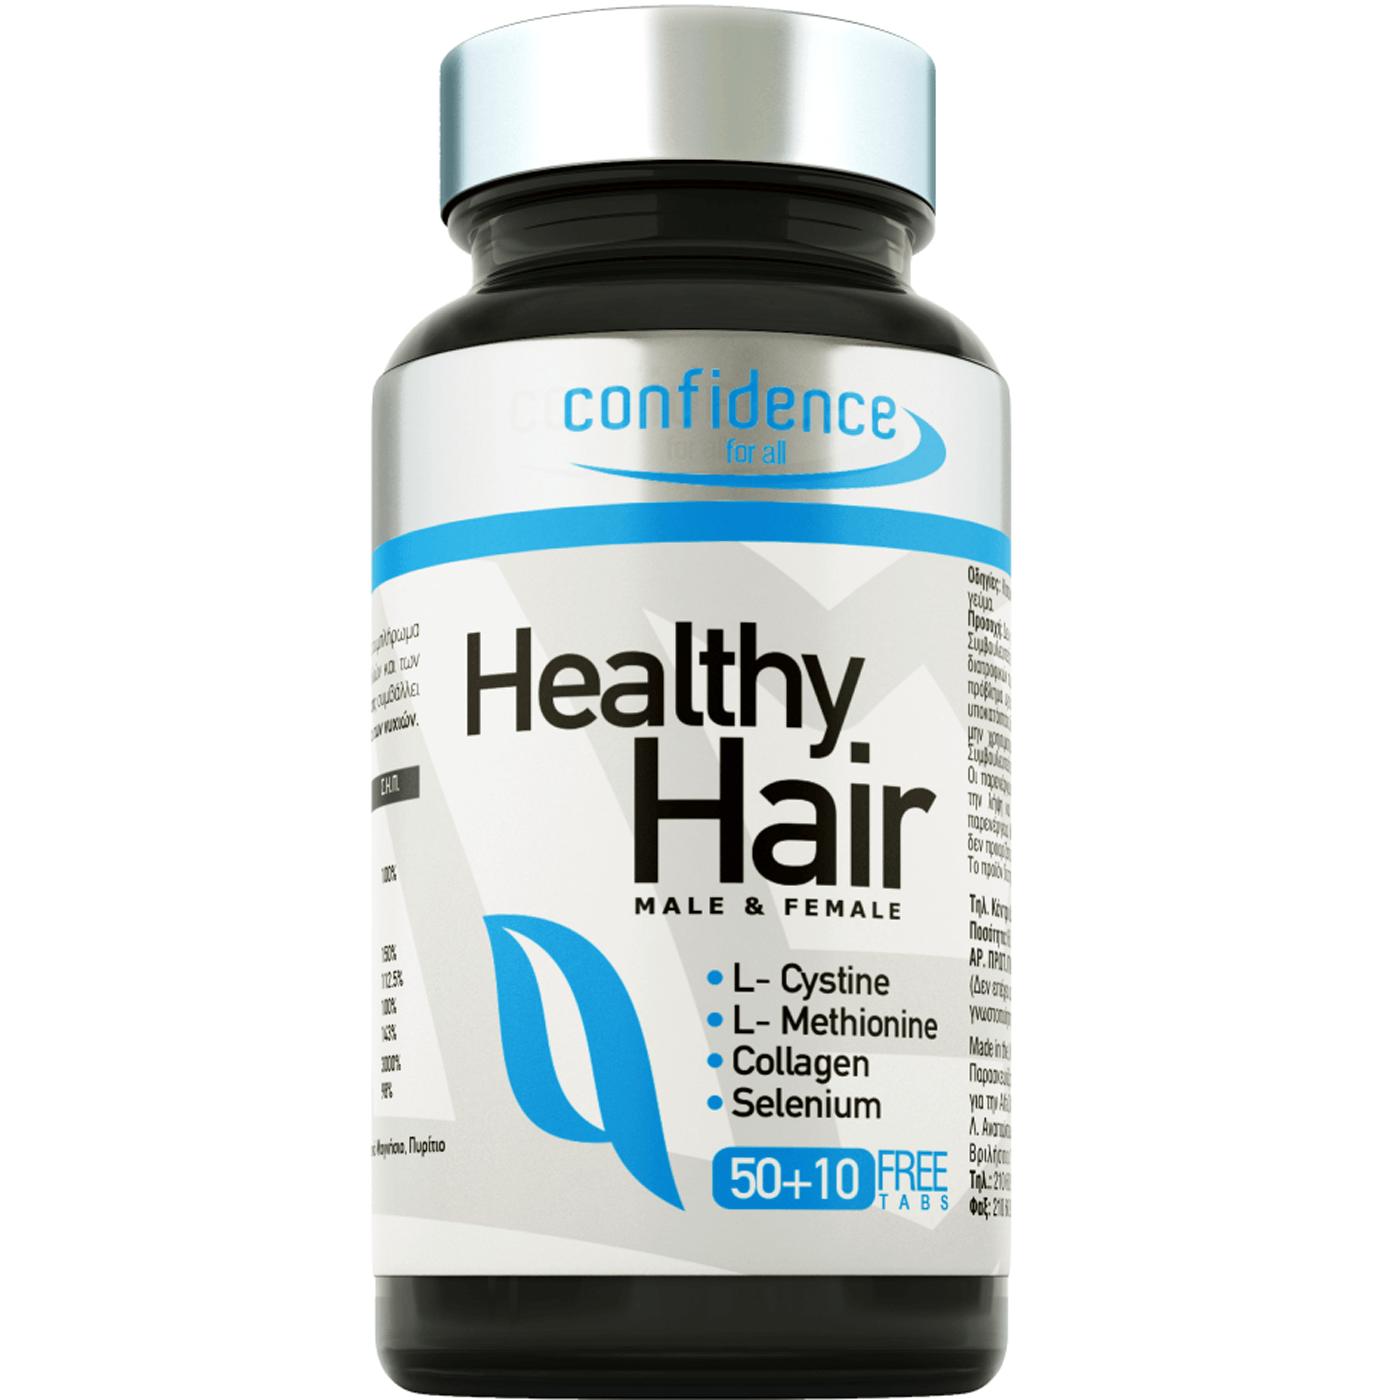 Confidence Healthy Hair Συμπλήρωμα Διατροφής που Συμβάλλει στην Μείωση της Τριχόπτωσης 60 tabs (50+10 δώρο)